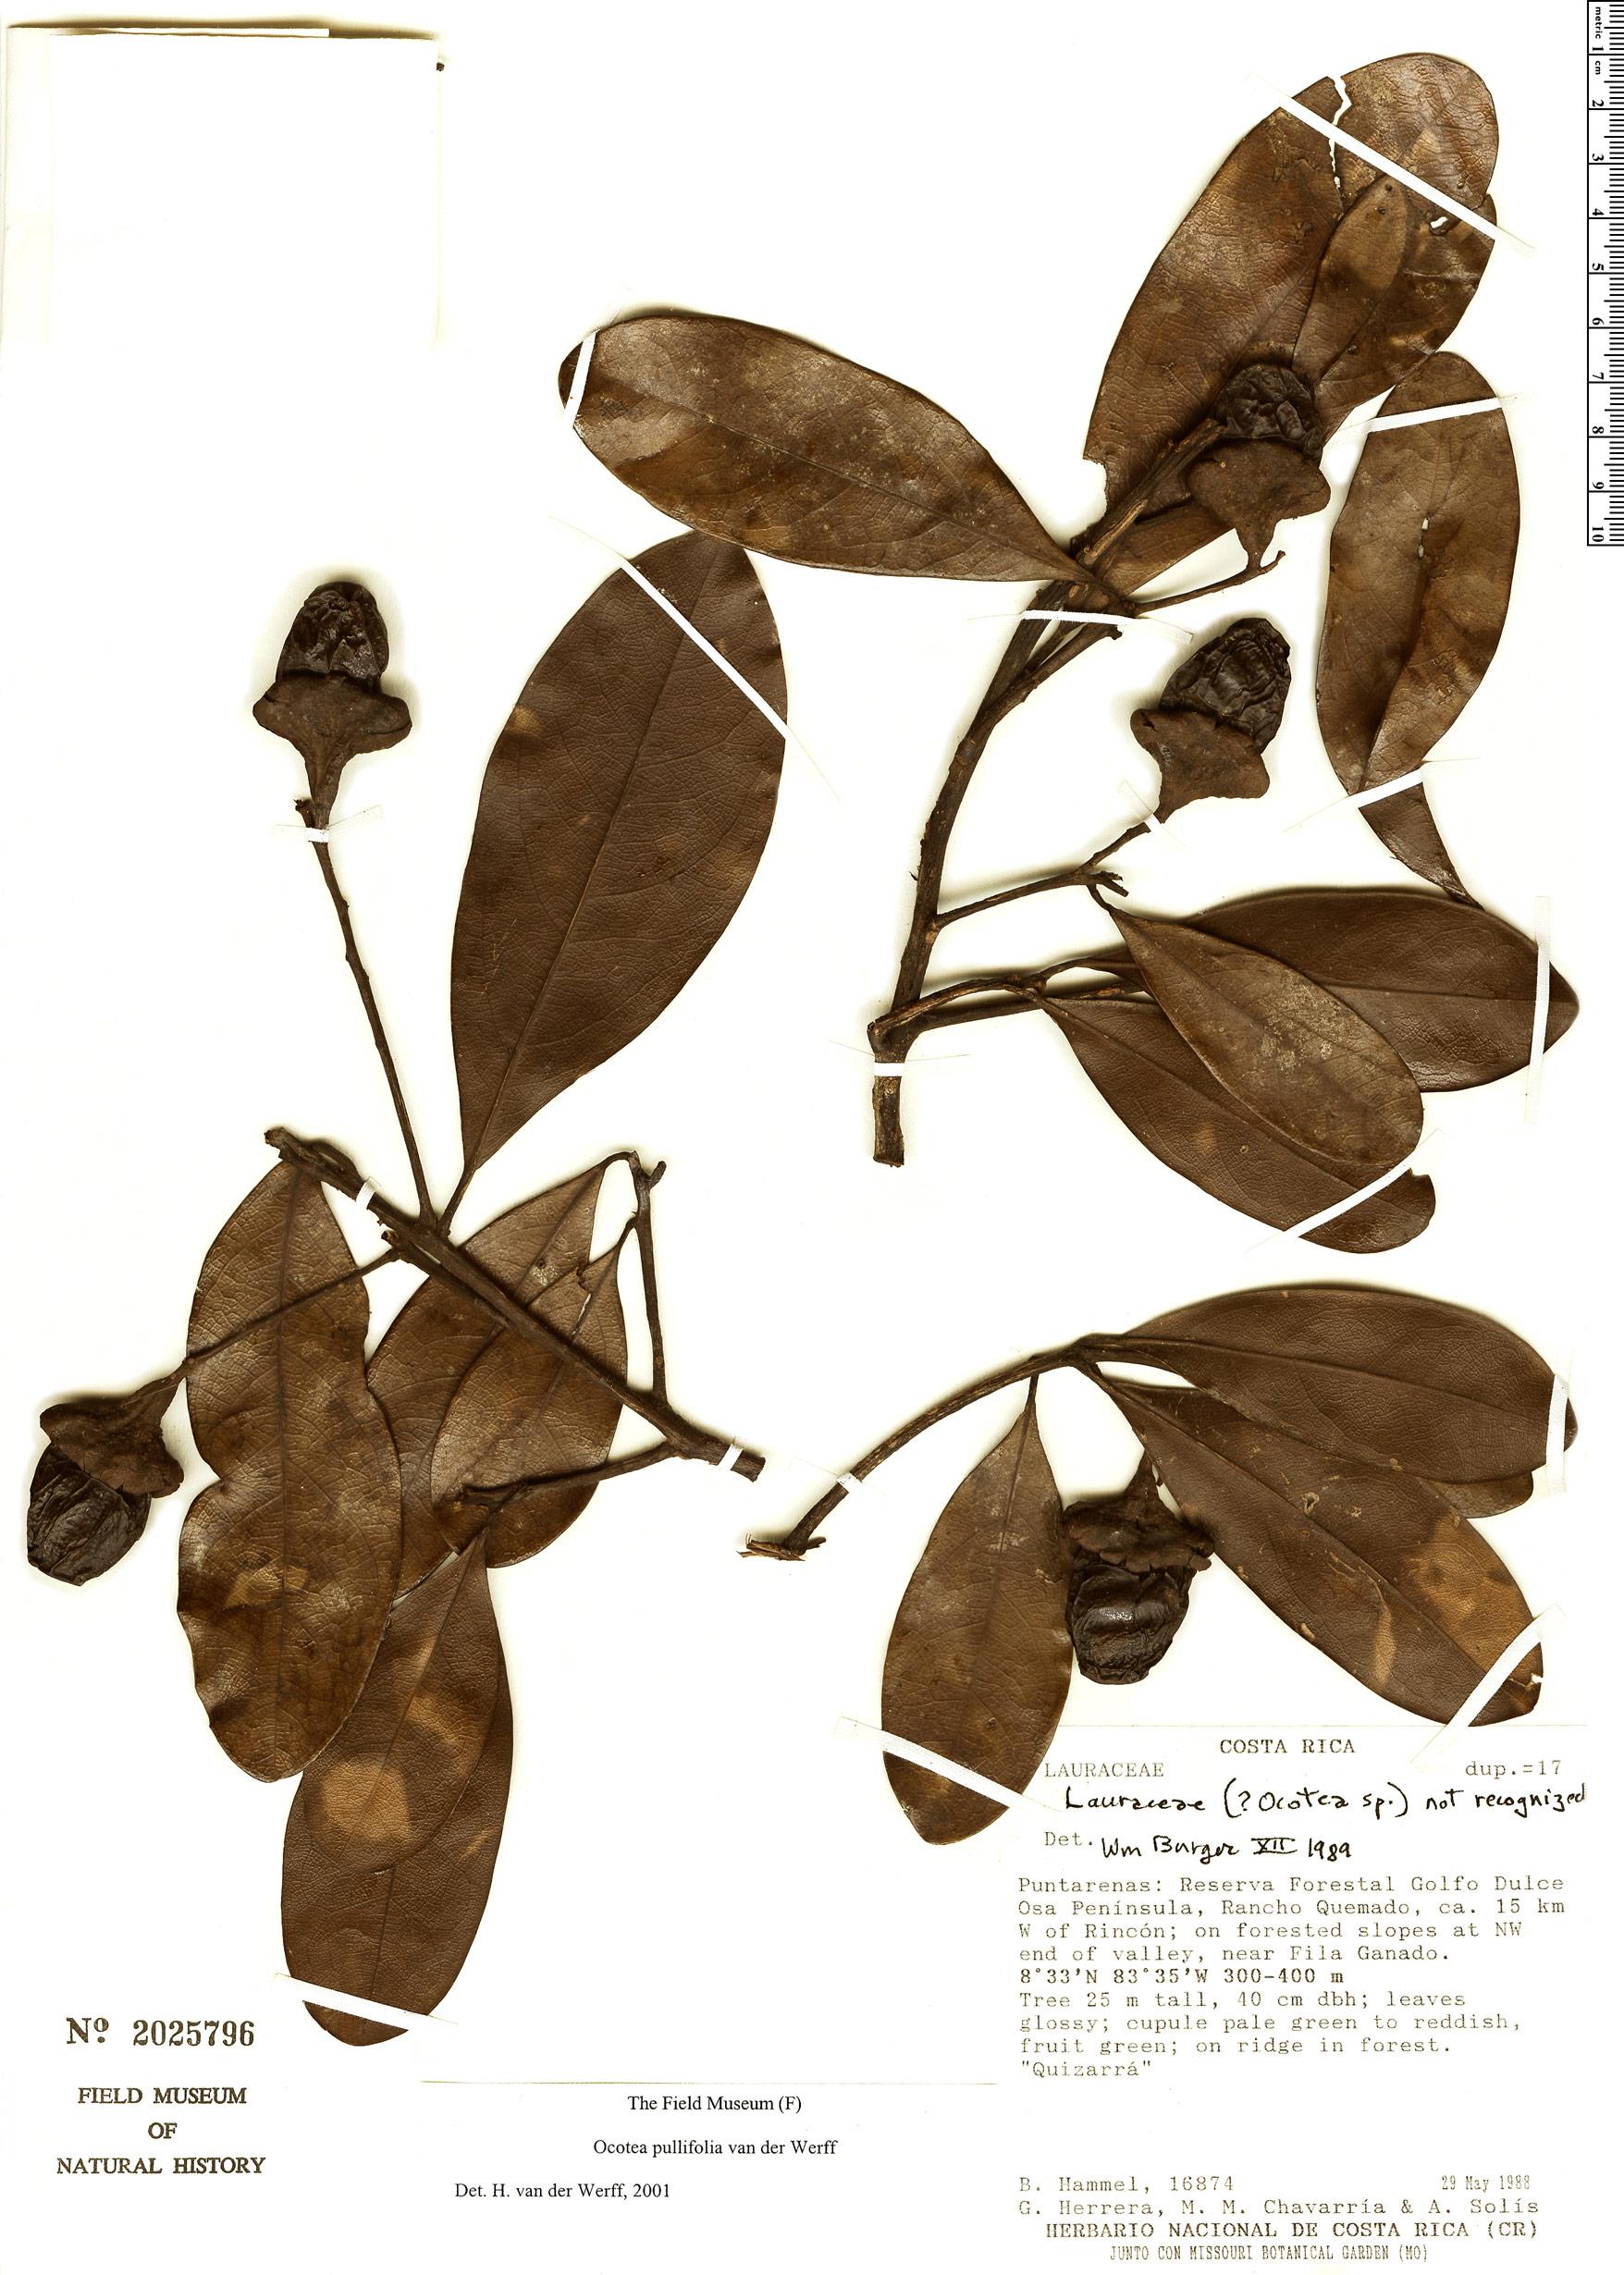 Specimen: Ocotea pullifolia